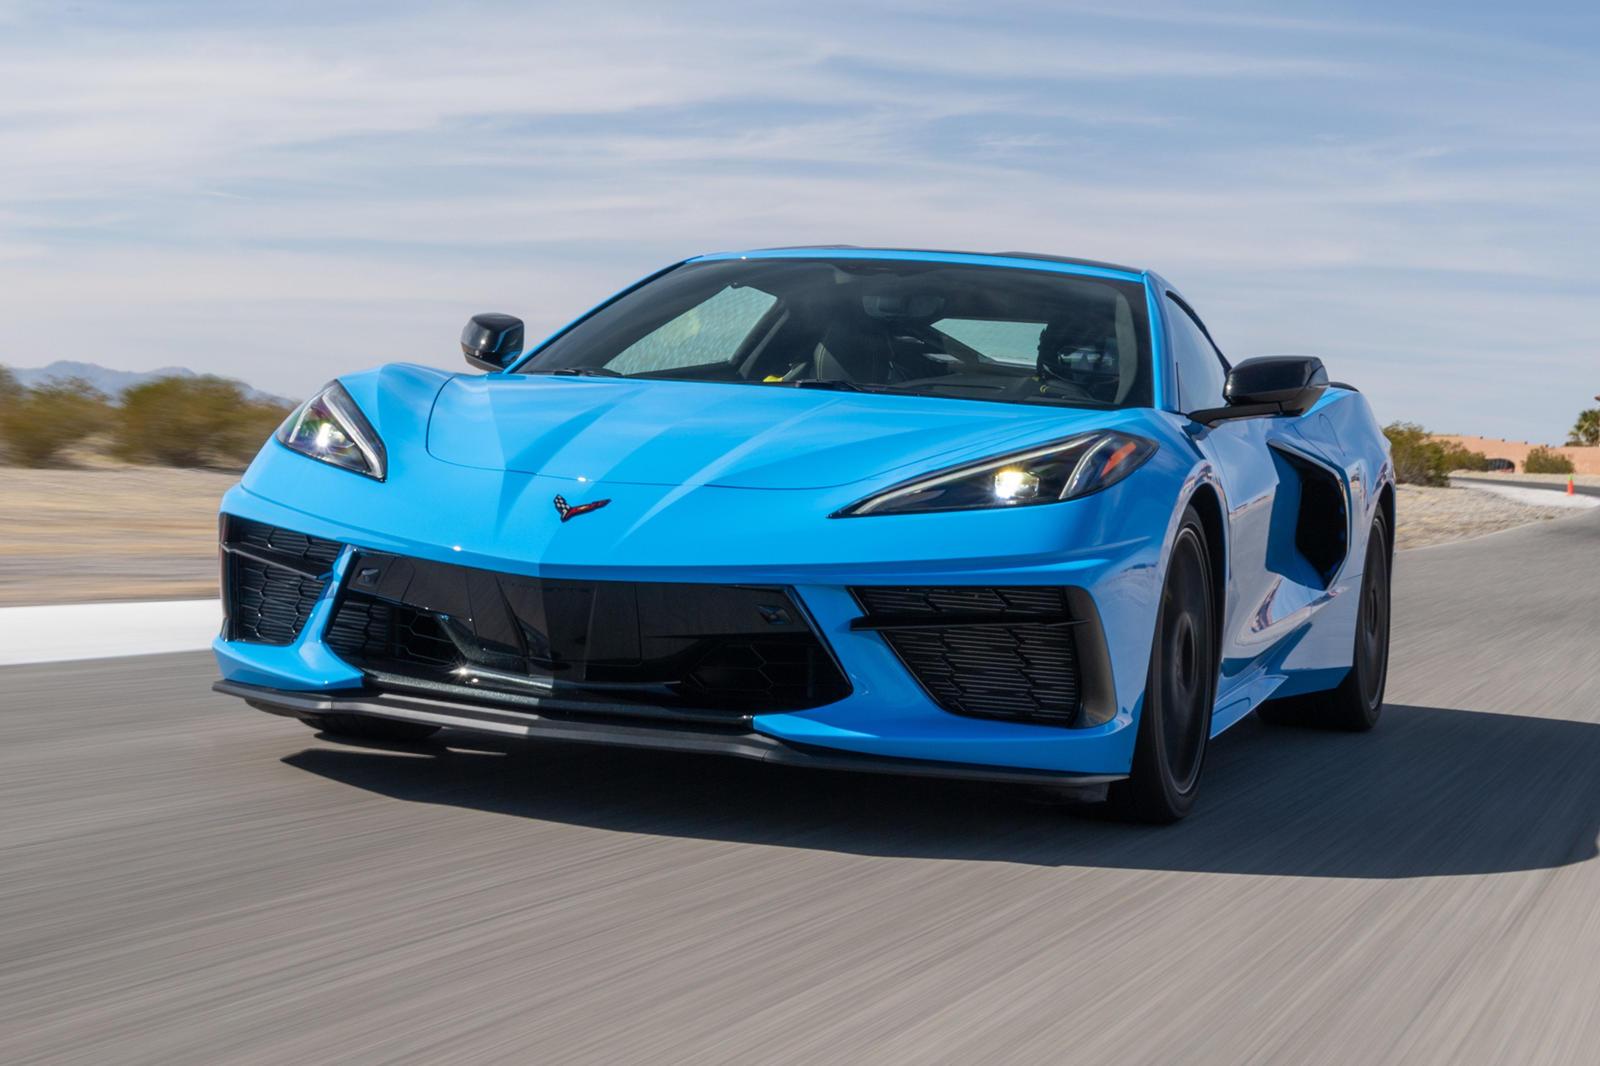 95868 Callaway Has Big Plans For The C8 Corvette